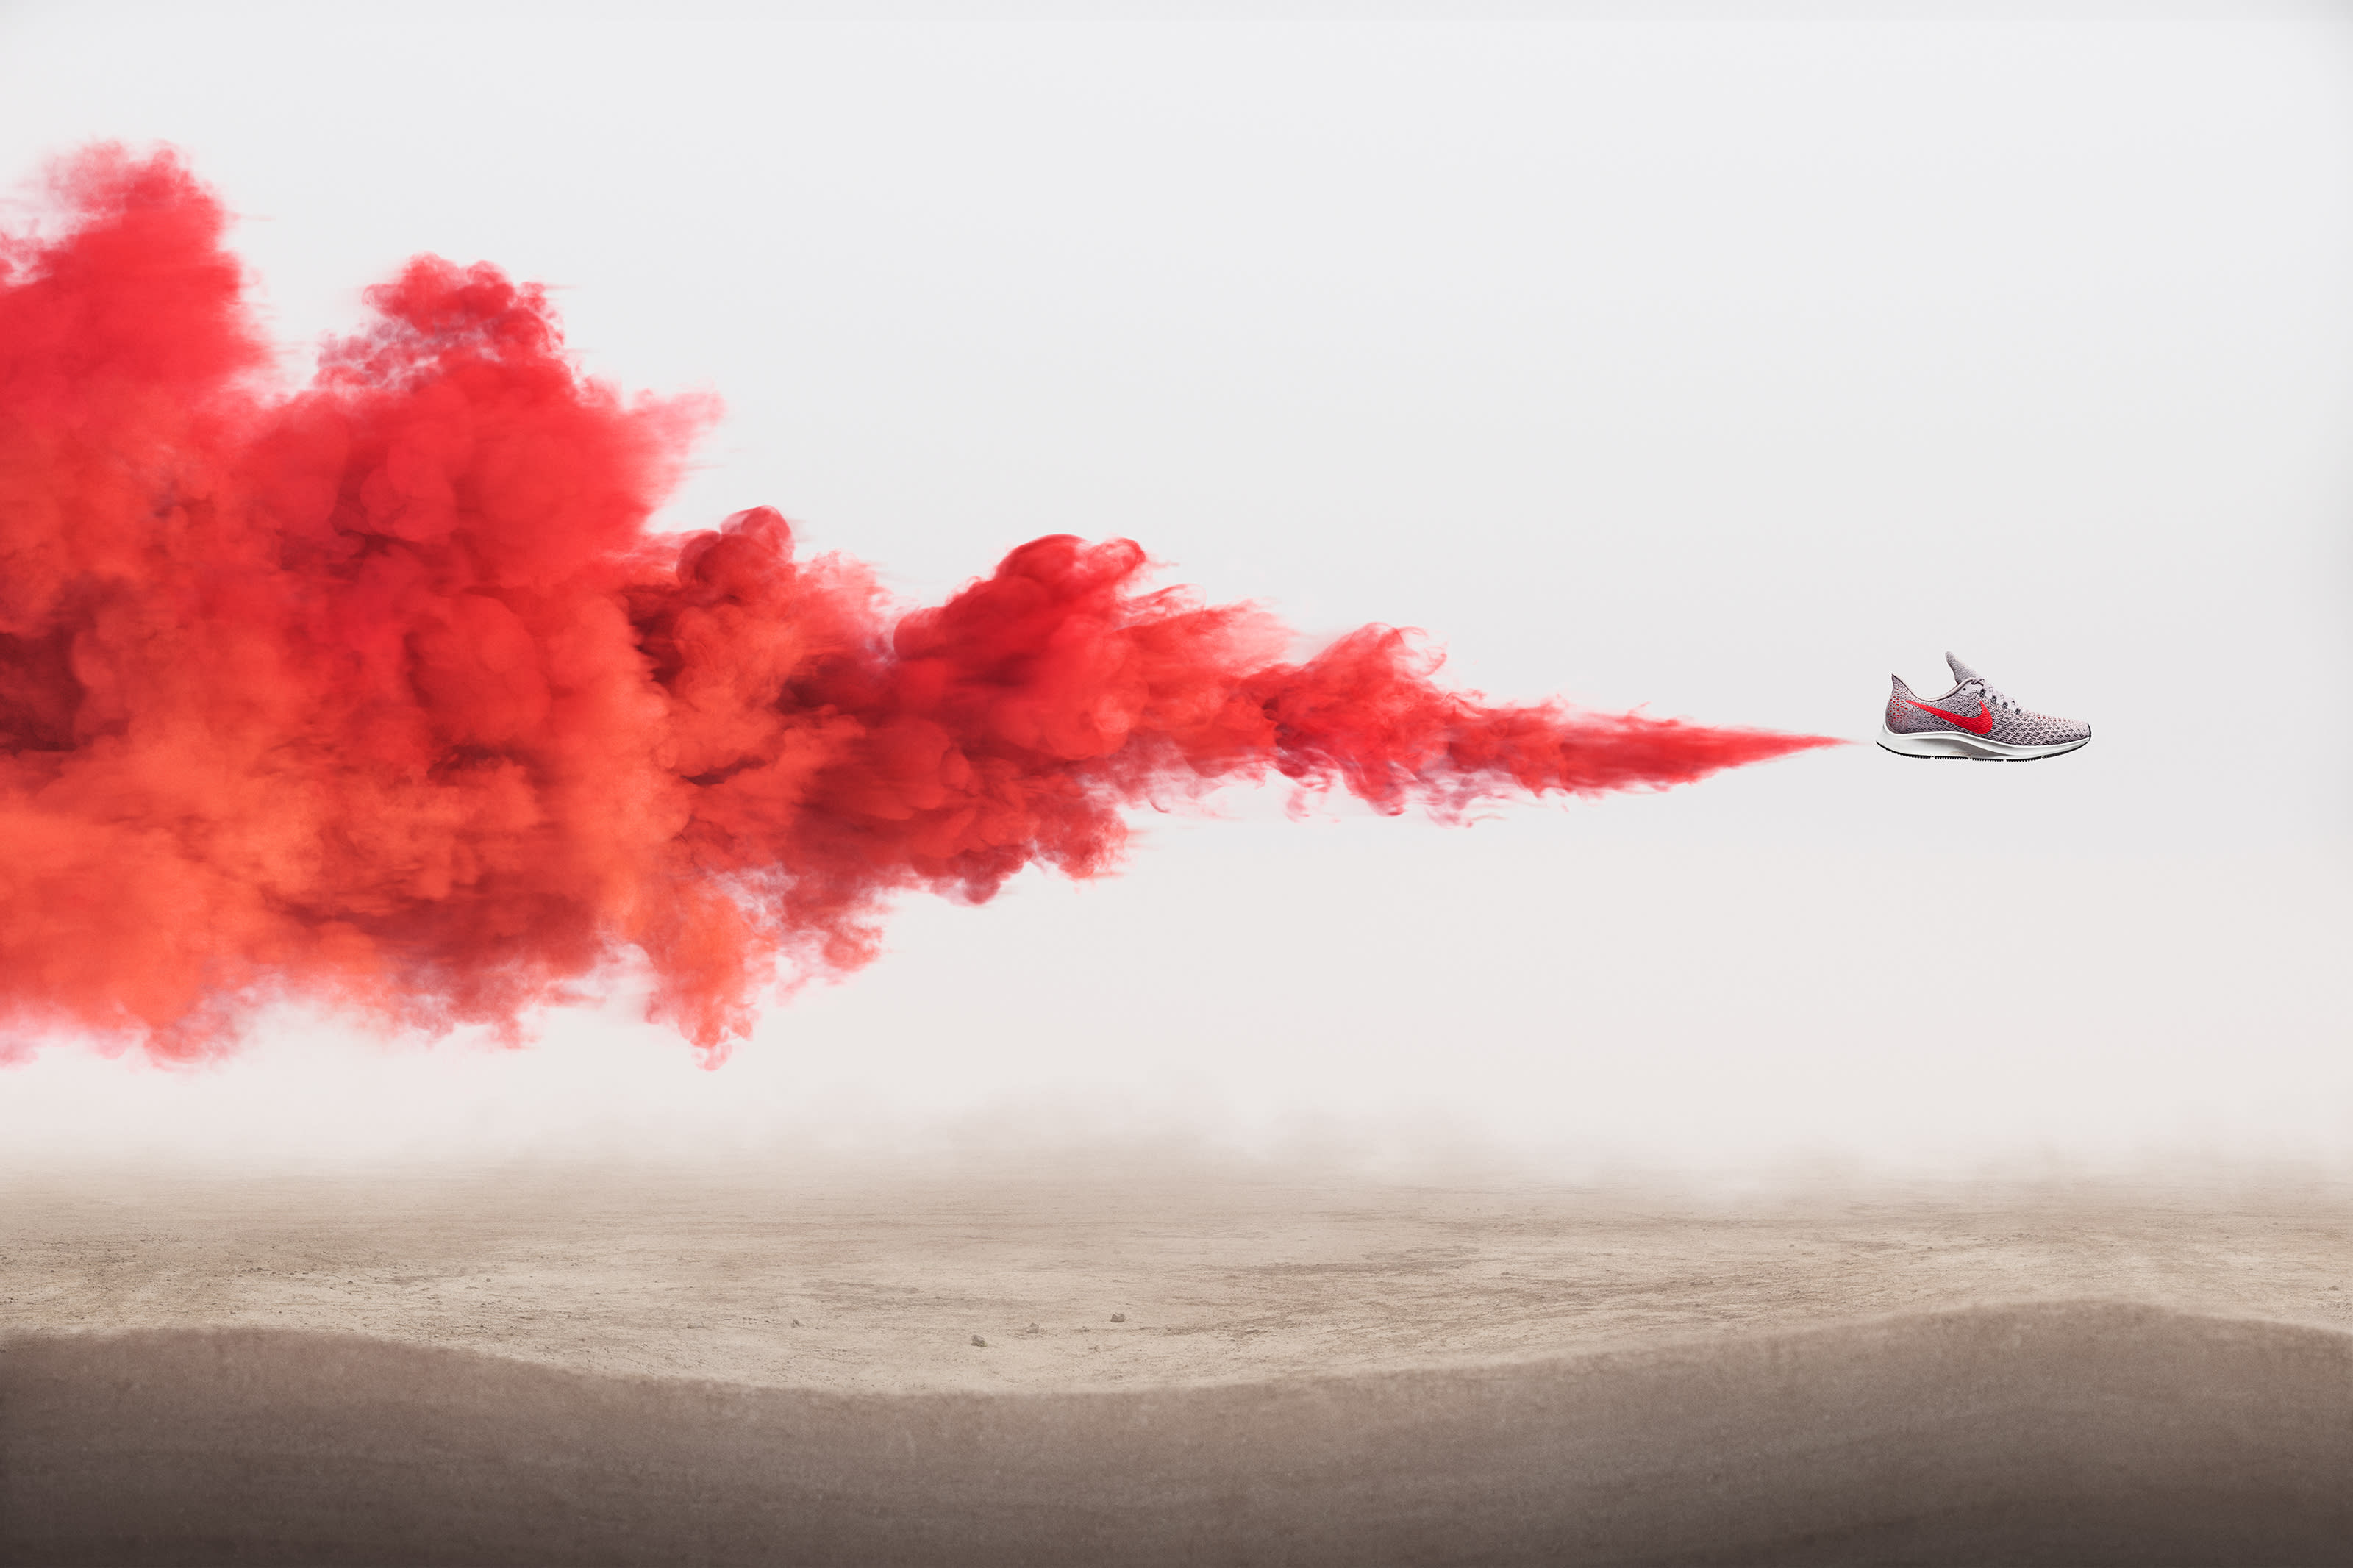 Nike Zoom Pegasus Turbo (Smoke Graphic)